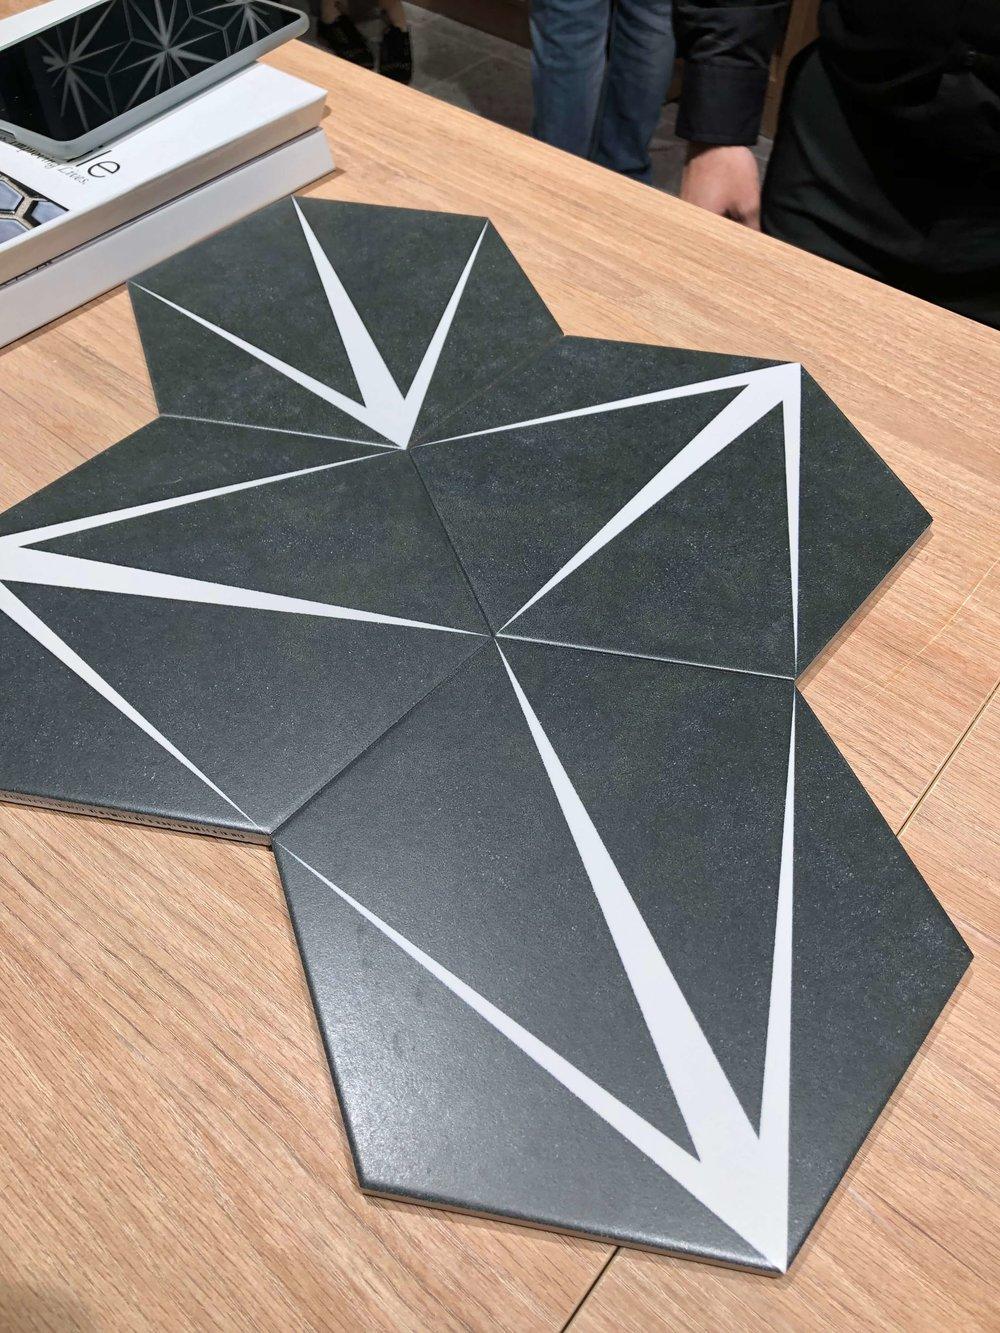 Porcelain cement look tiles | KBIS 2019 Surfaces Trends